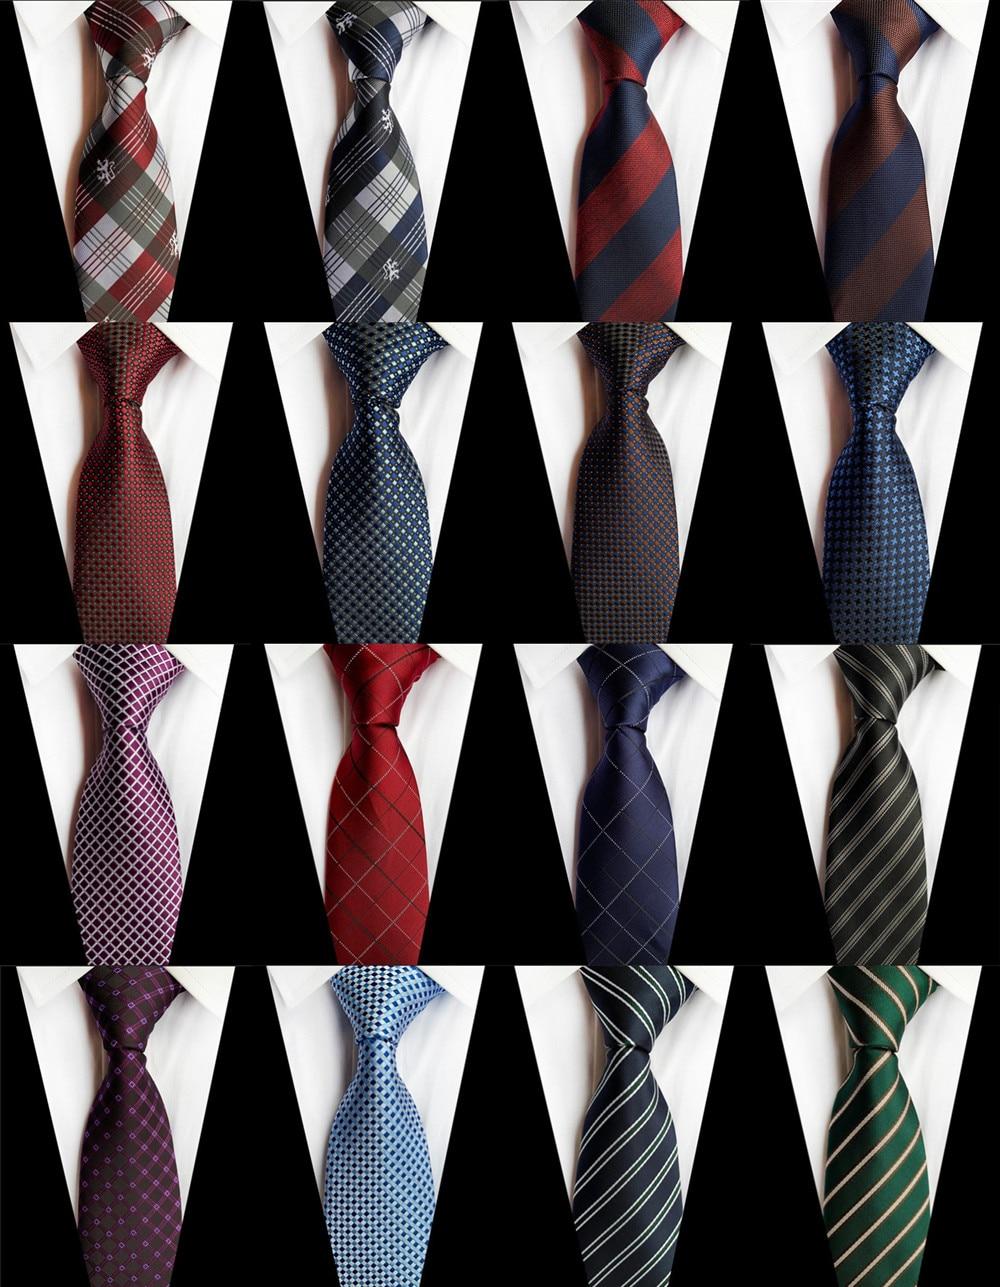 New Dark Color 8cm Ties For Man Classic Stripe Plaid Geometric Necktie Business Wedding Party Gravatas Party Jacquard Ties